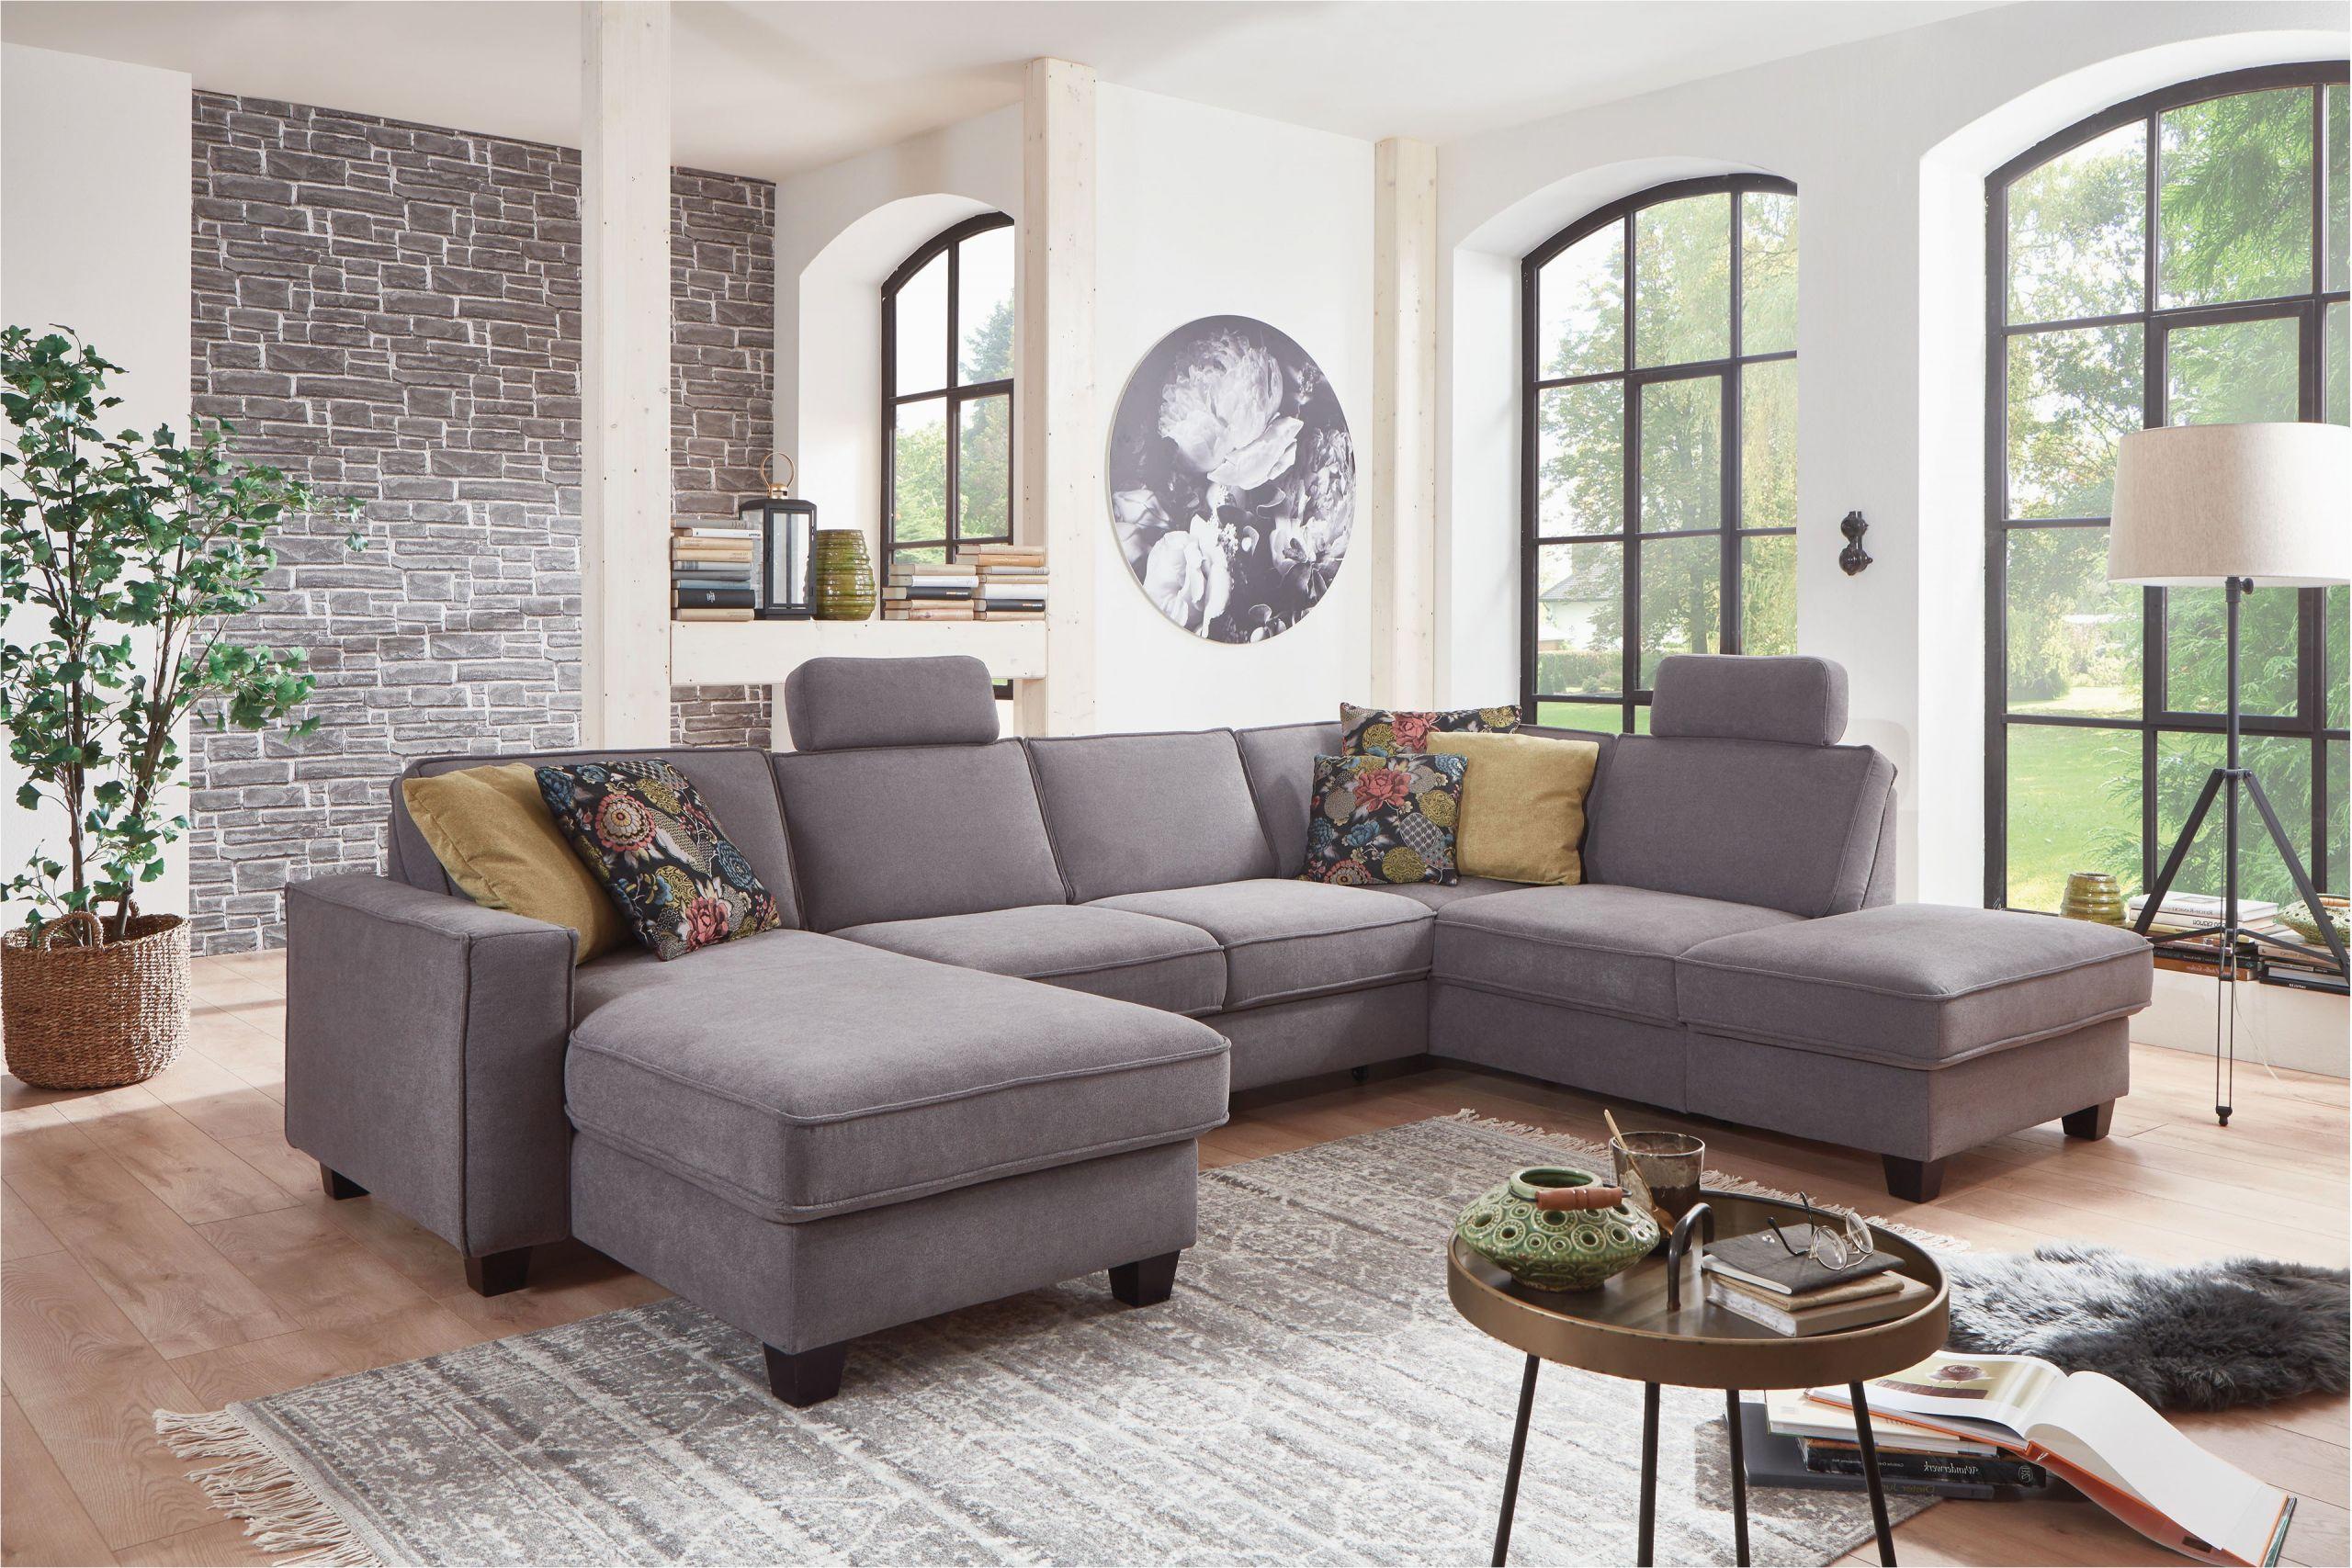 Hjort Knudsen sofa Stoff County Von Sit & More Xxl sofa Variante Rechts Grau